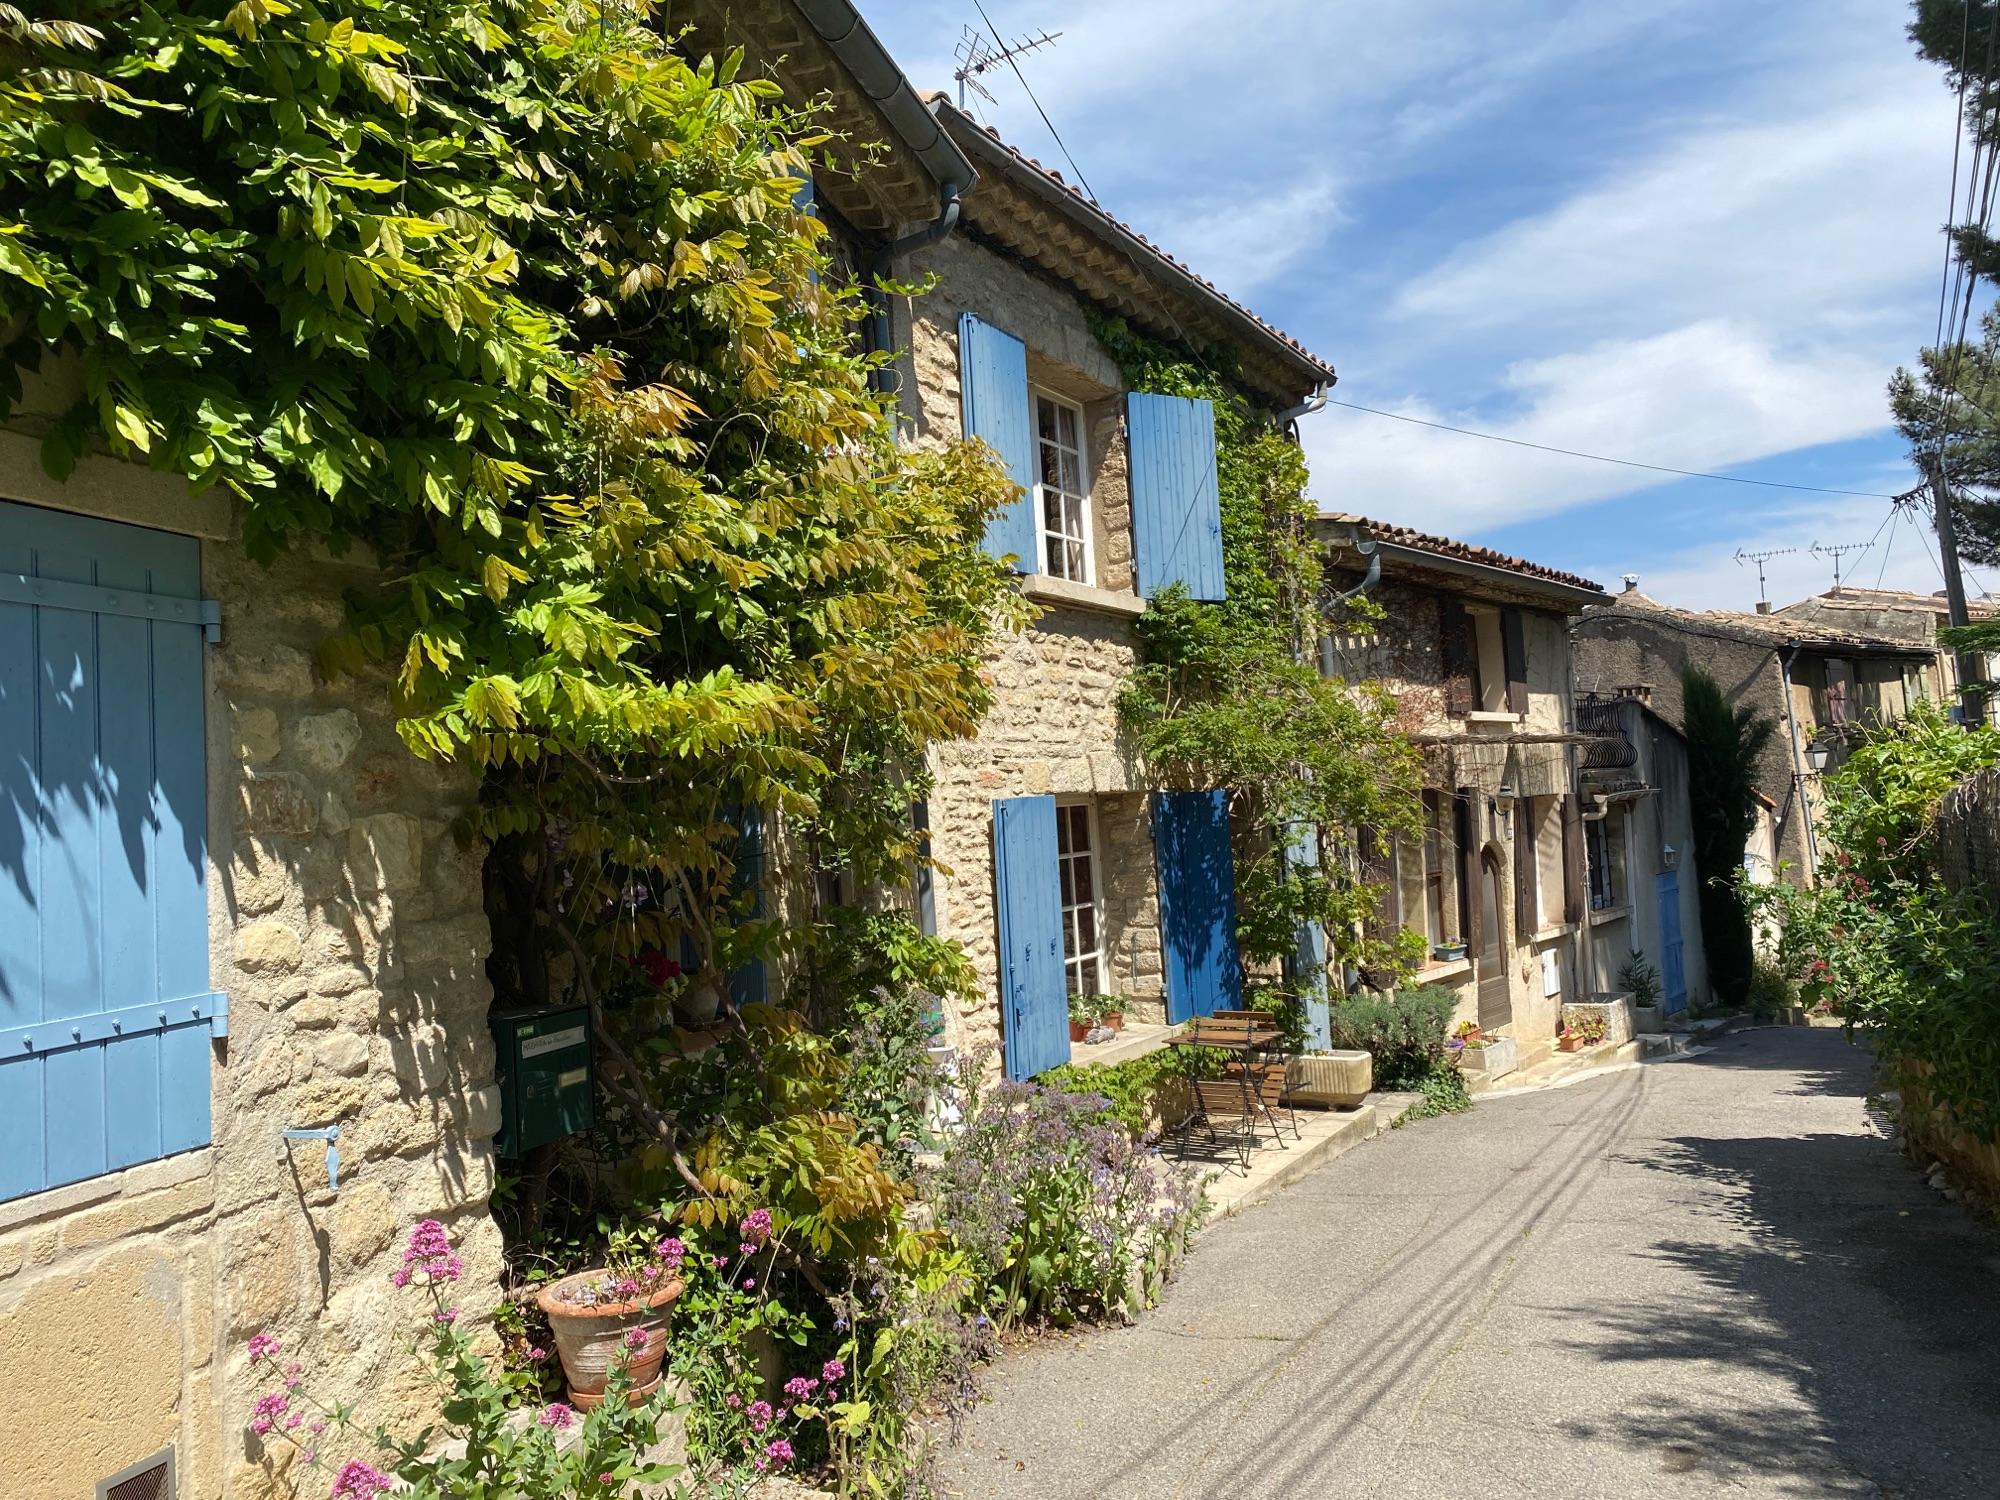 Деревня Cucuron. Двое городских ворот 14 века, донжон, лавуар и вот такие домики...